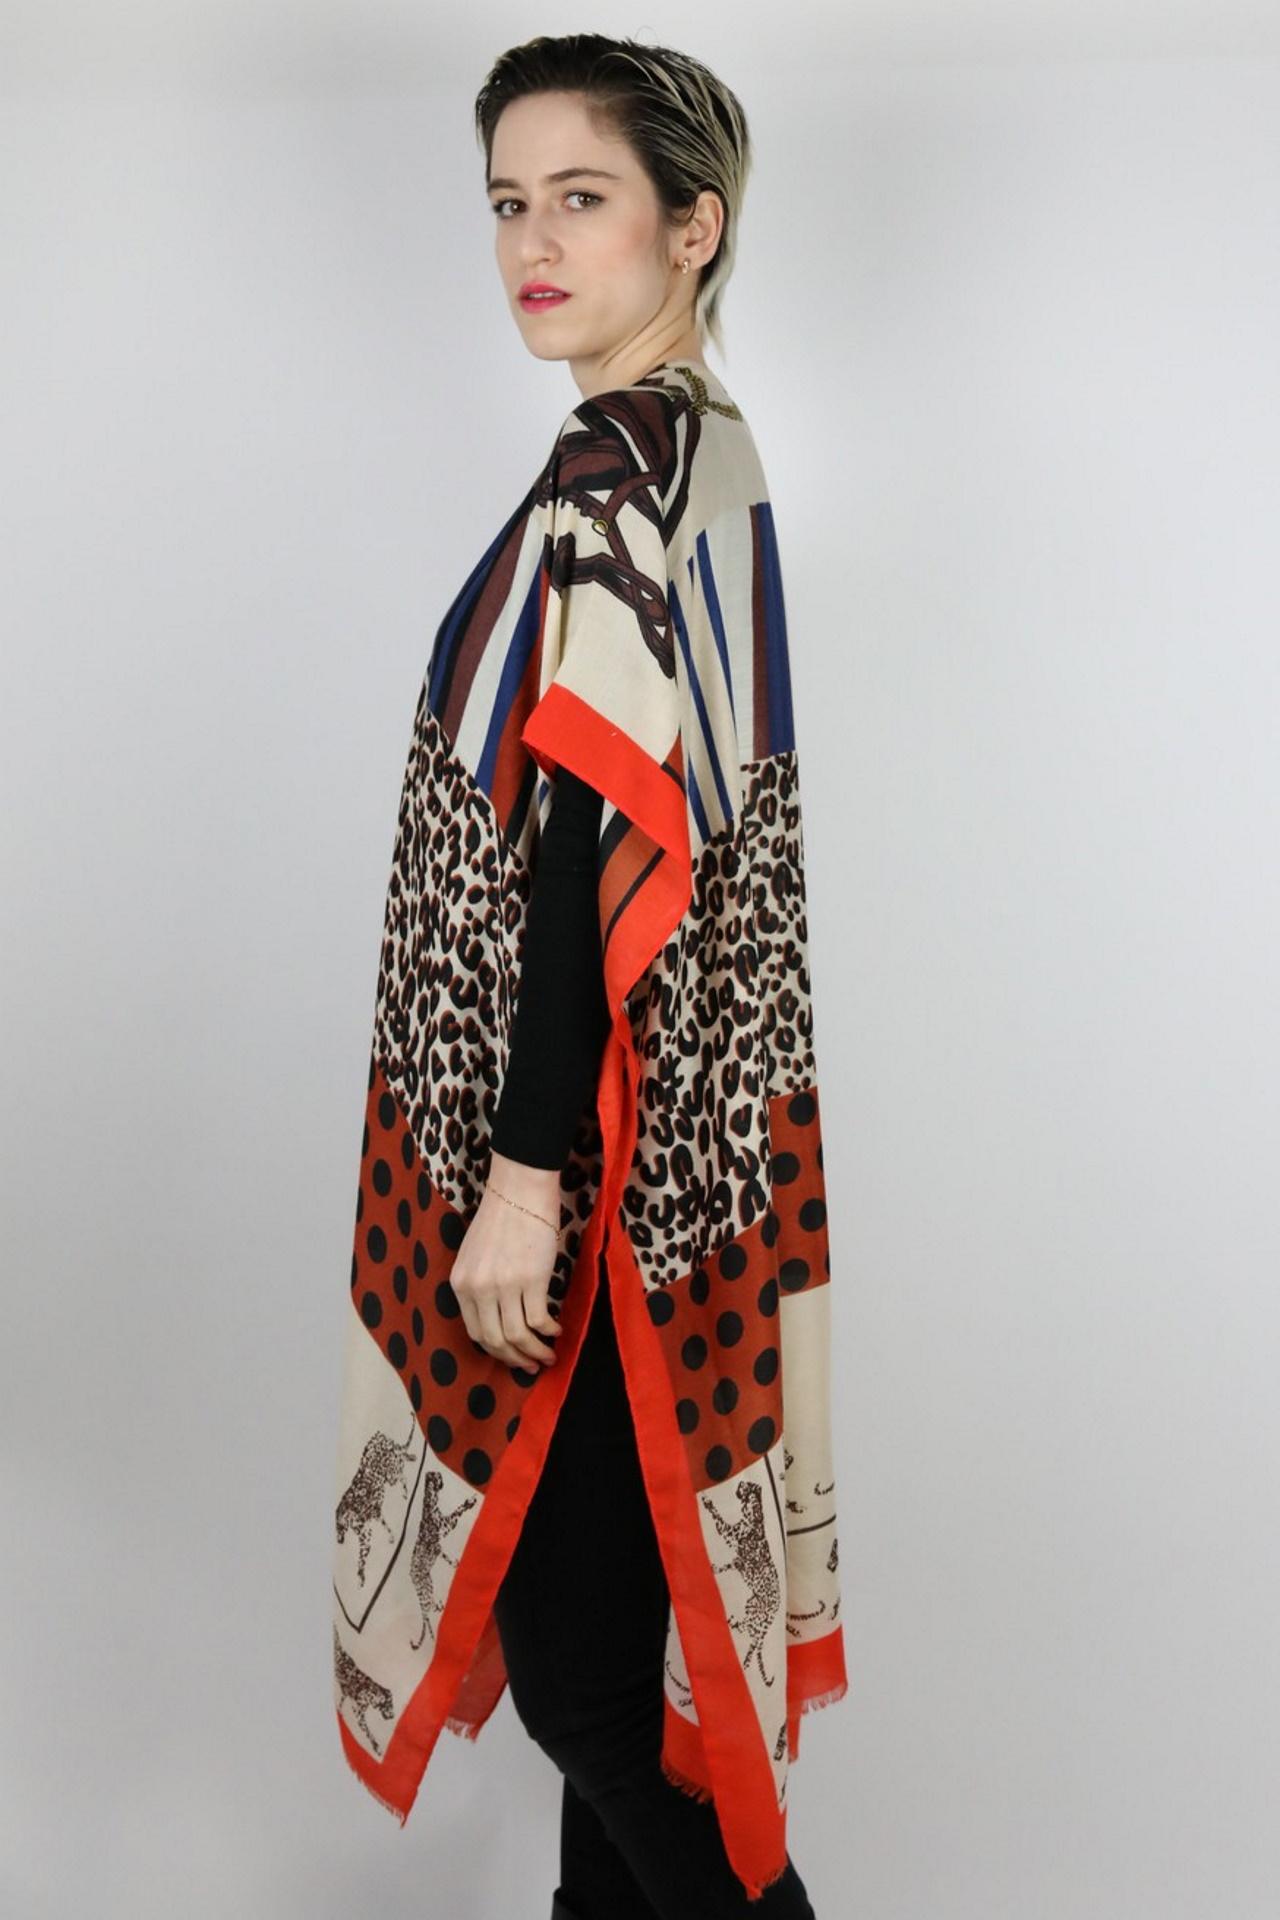 CLOTHES03 STOLA DONNA FOULARD CARDIGAN COPRISPALLE 2 1stAmerican elegante stola da donna foulard cardigan coprispalle